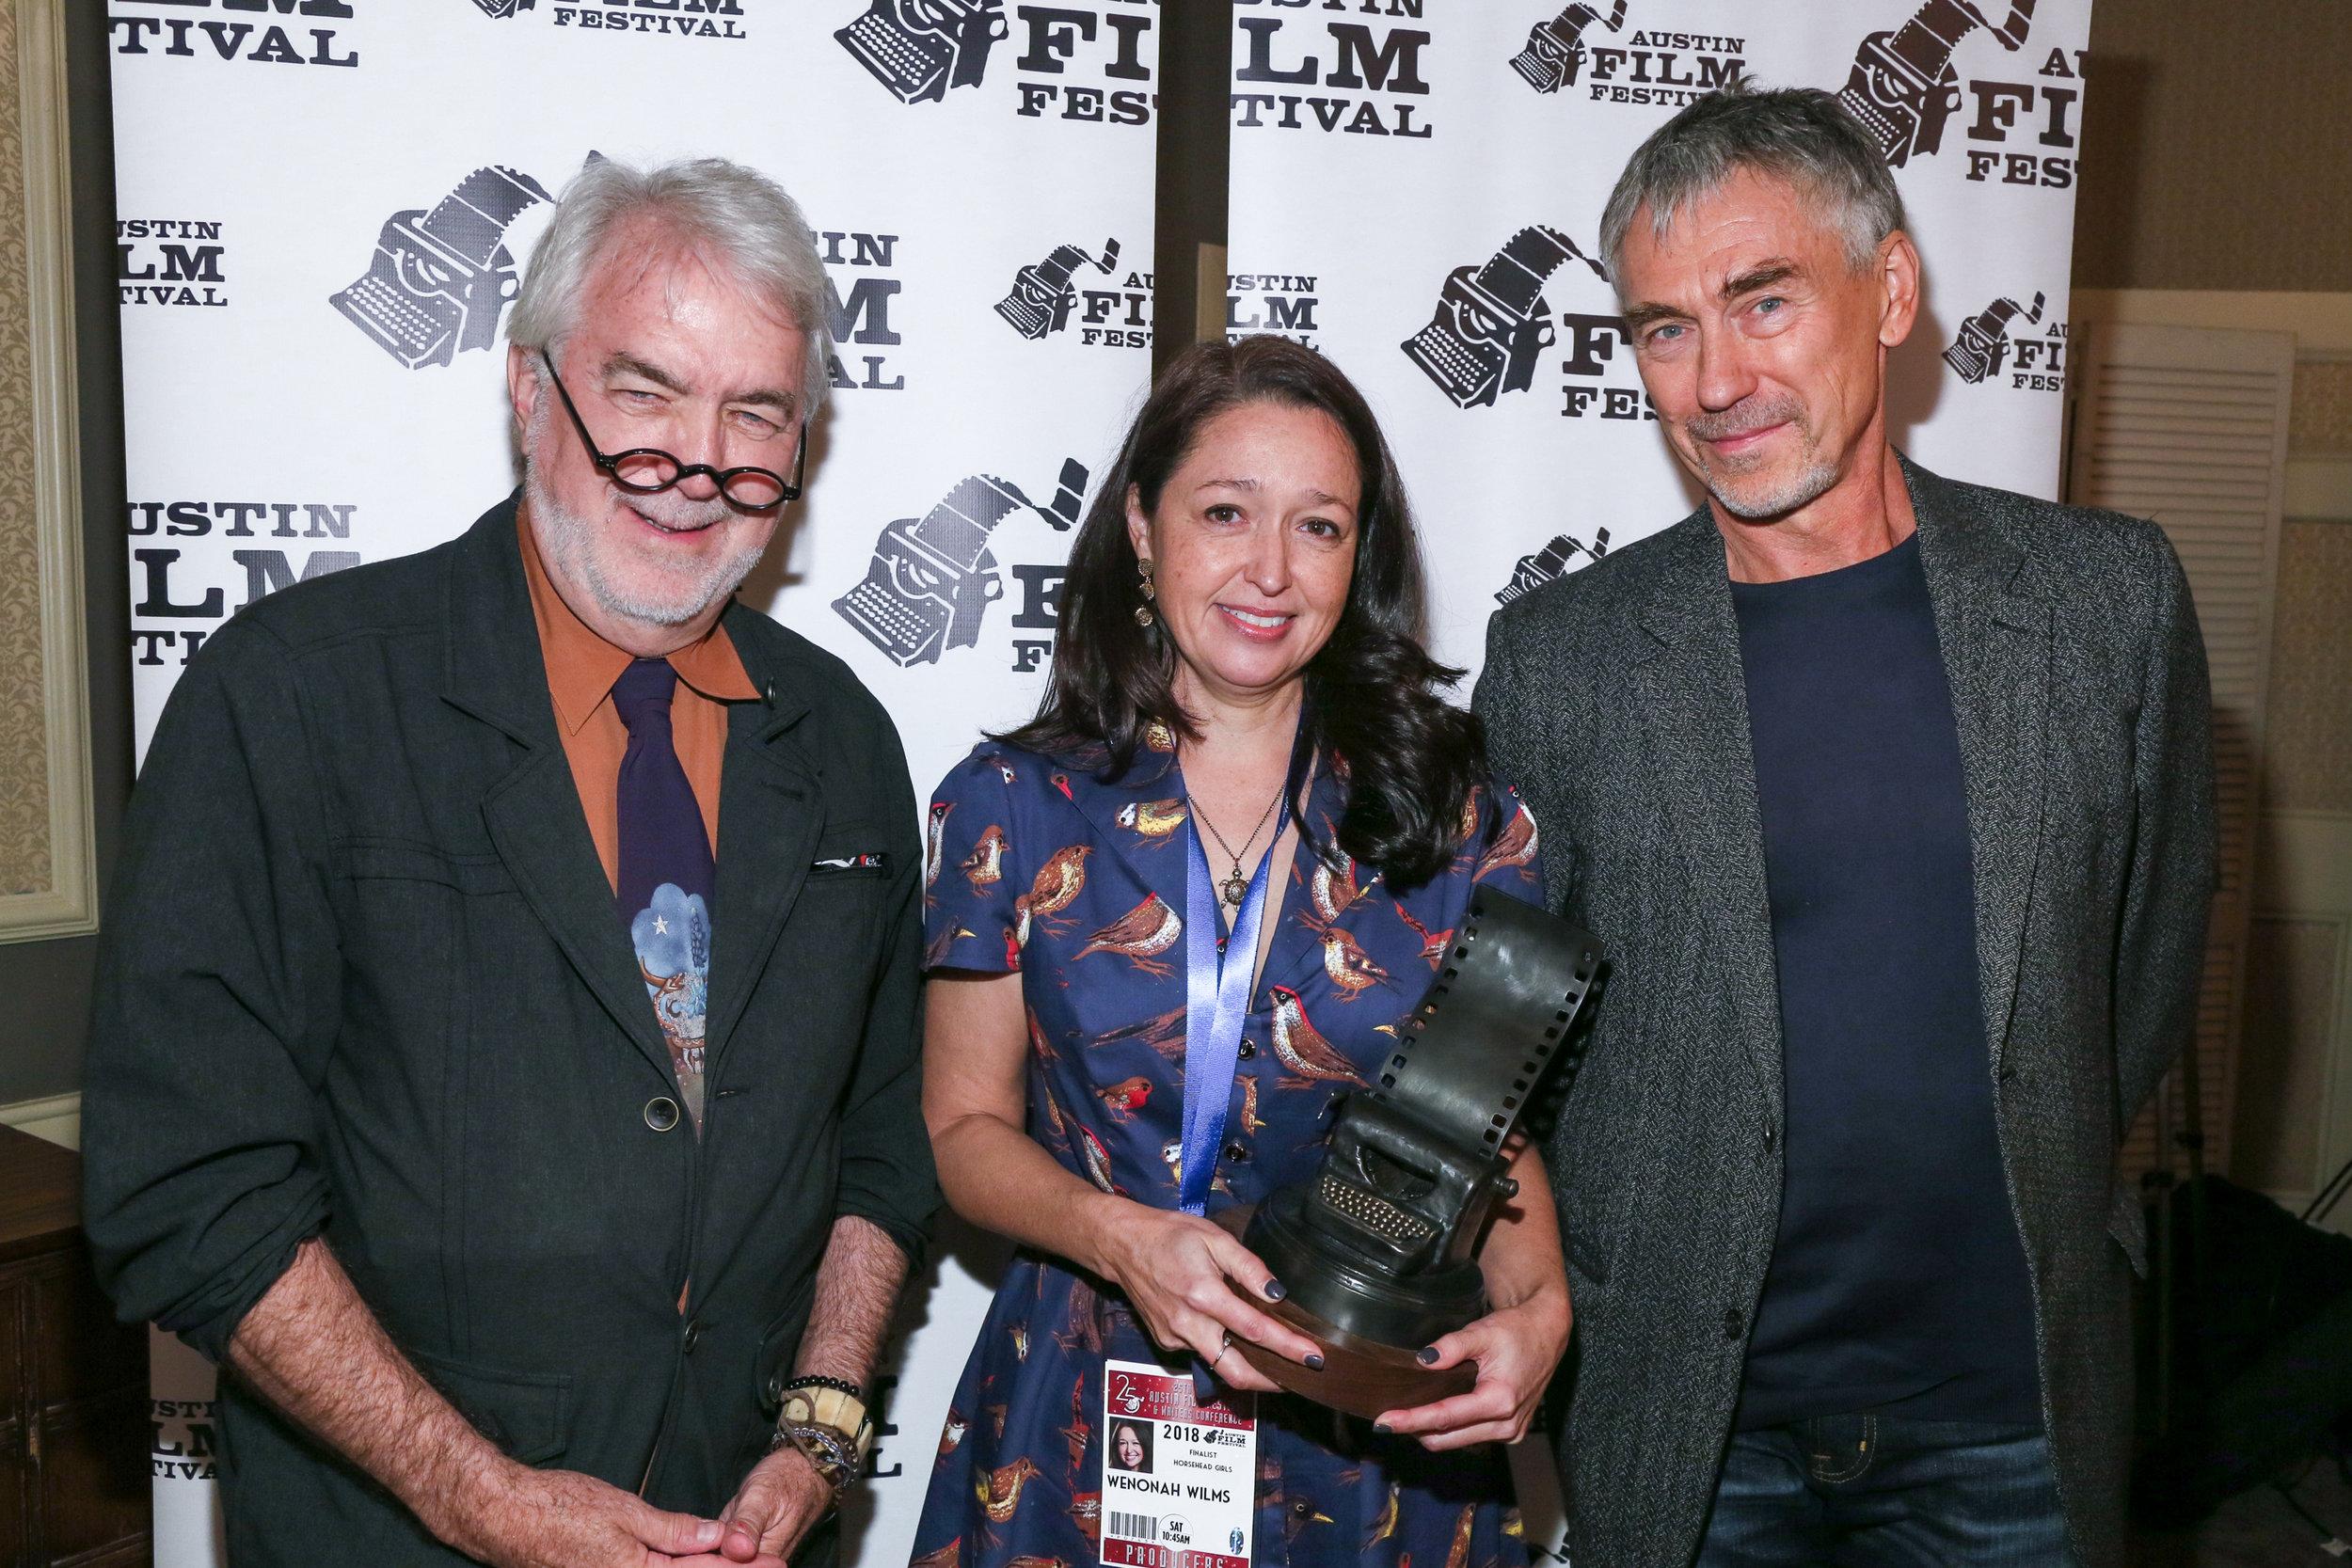 2018 Austin Film Festival. Jim Hart, Wenonah Wilms, Tony Gilroy